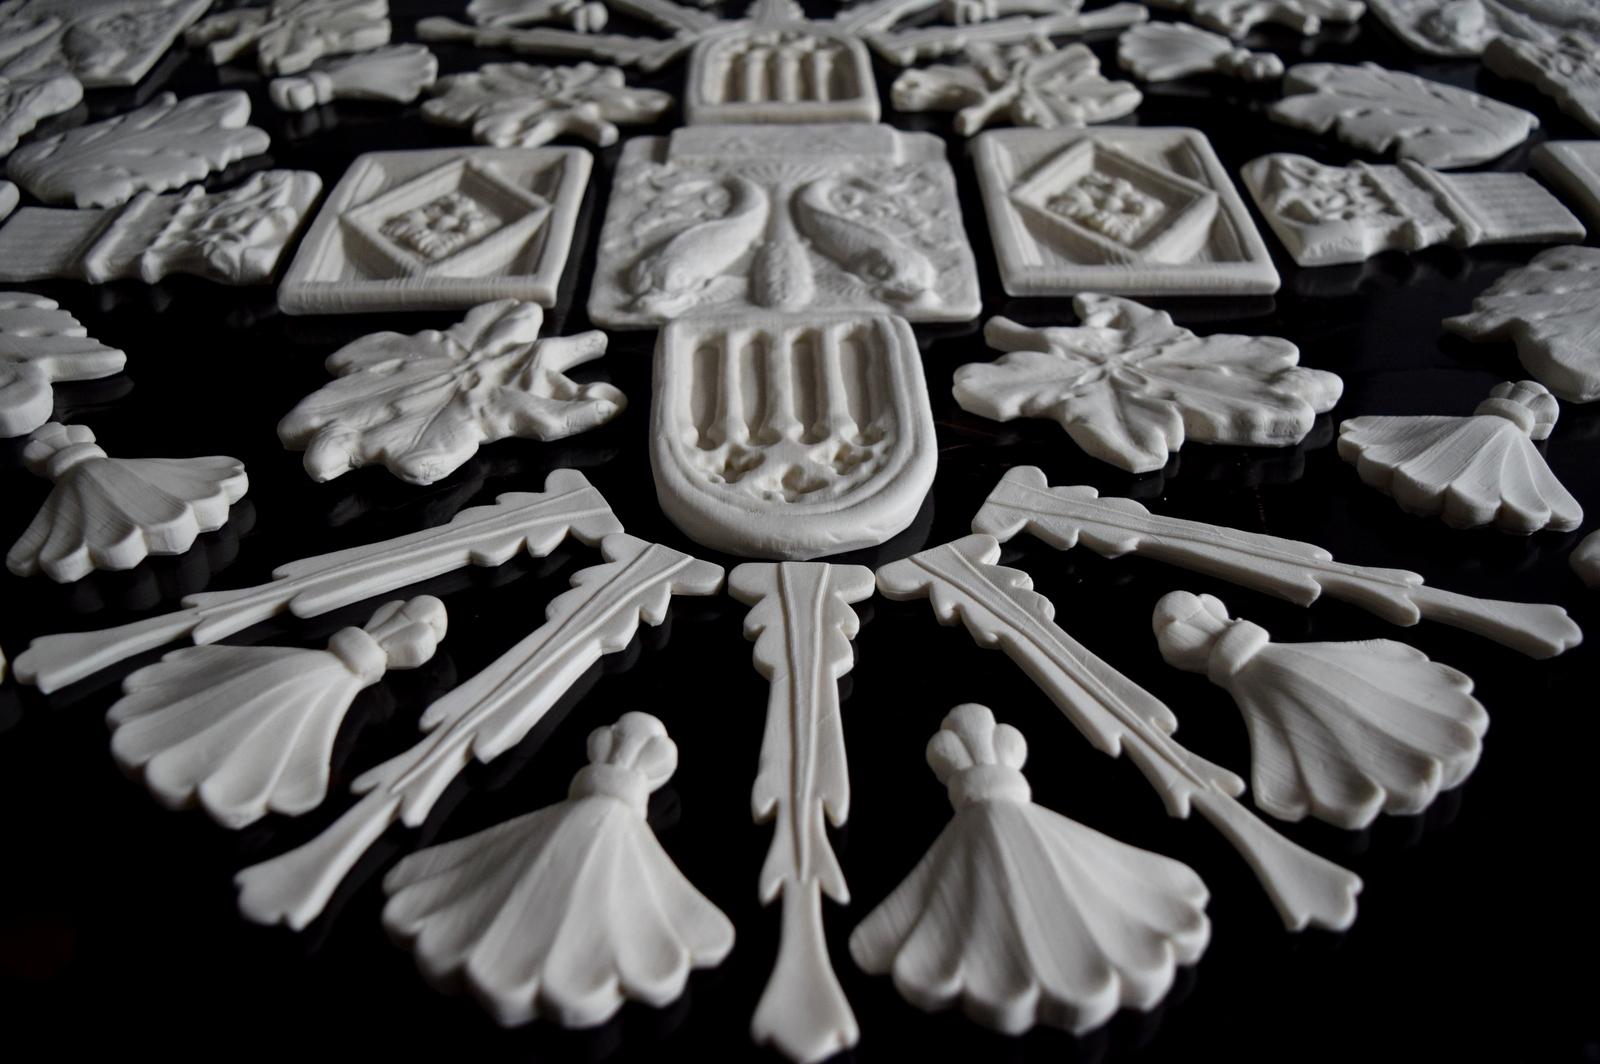 Alabaster Ruins - Tasha Marks - AVM Curiosities - Photo courtesy of artist (14) lo-res.JPG